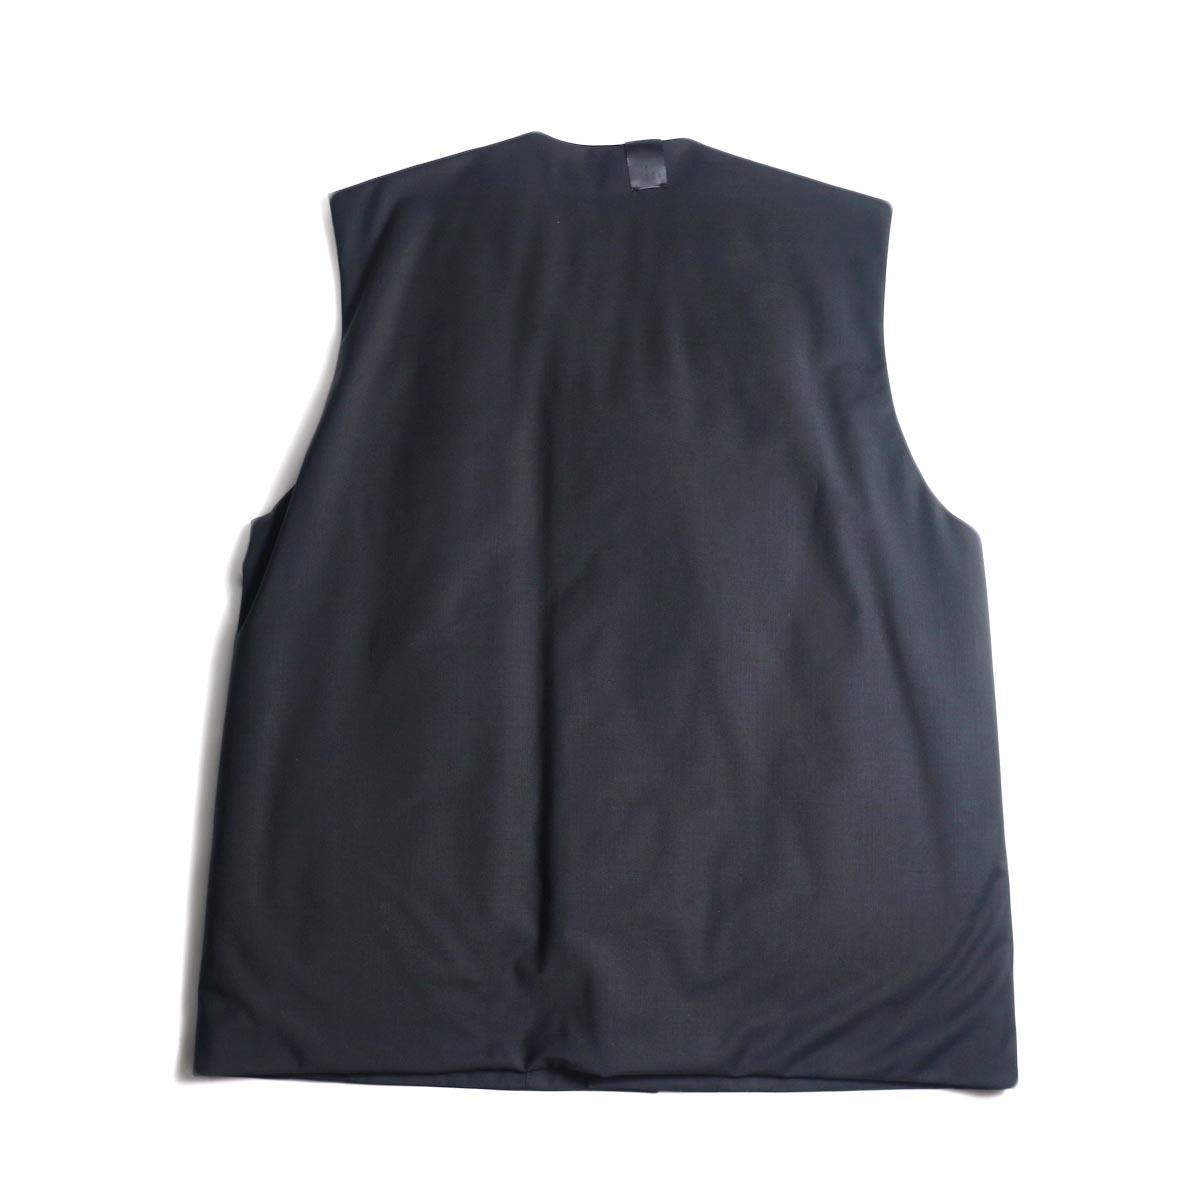 N.HOOLYWOOD / 2202-VE03-002 Vest (Black) 背面